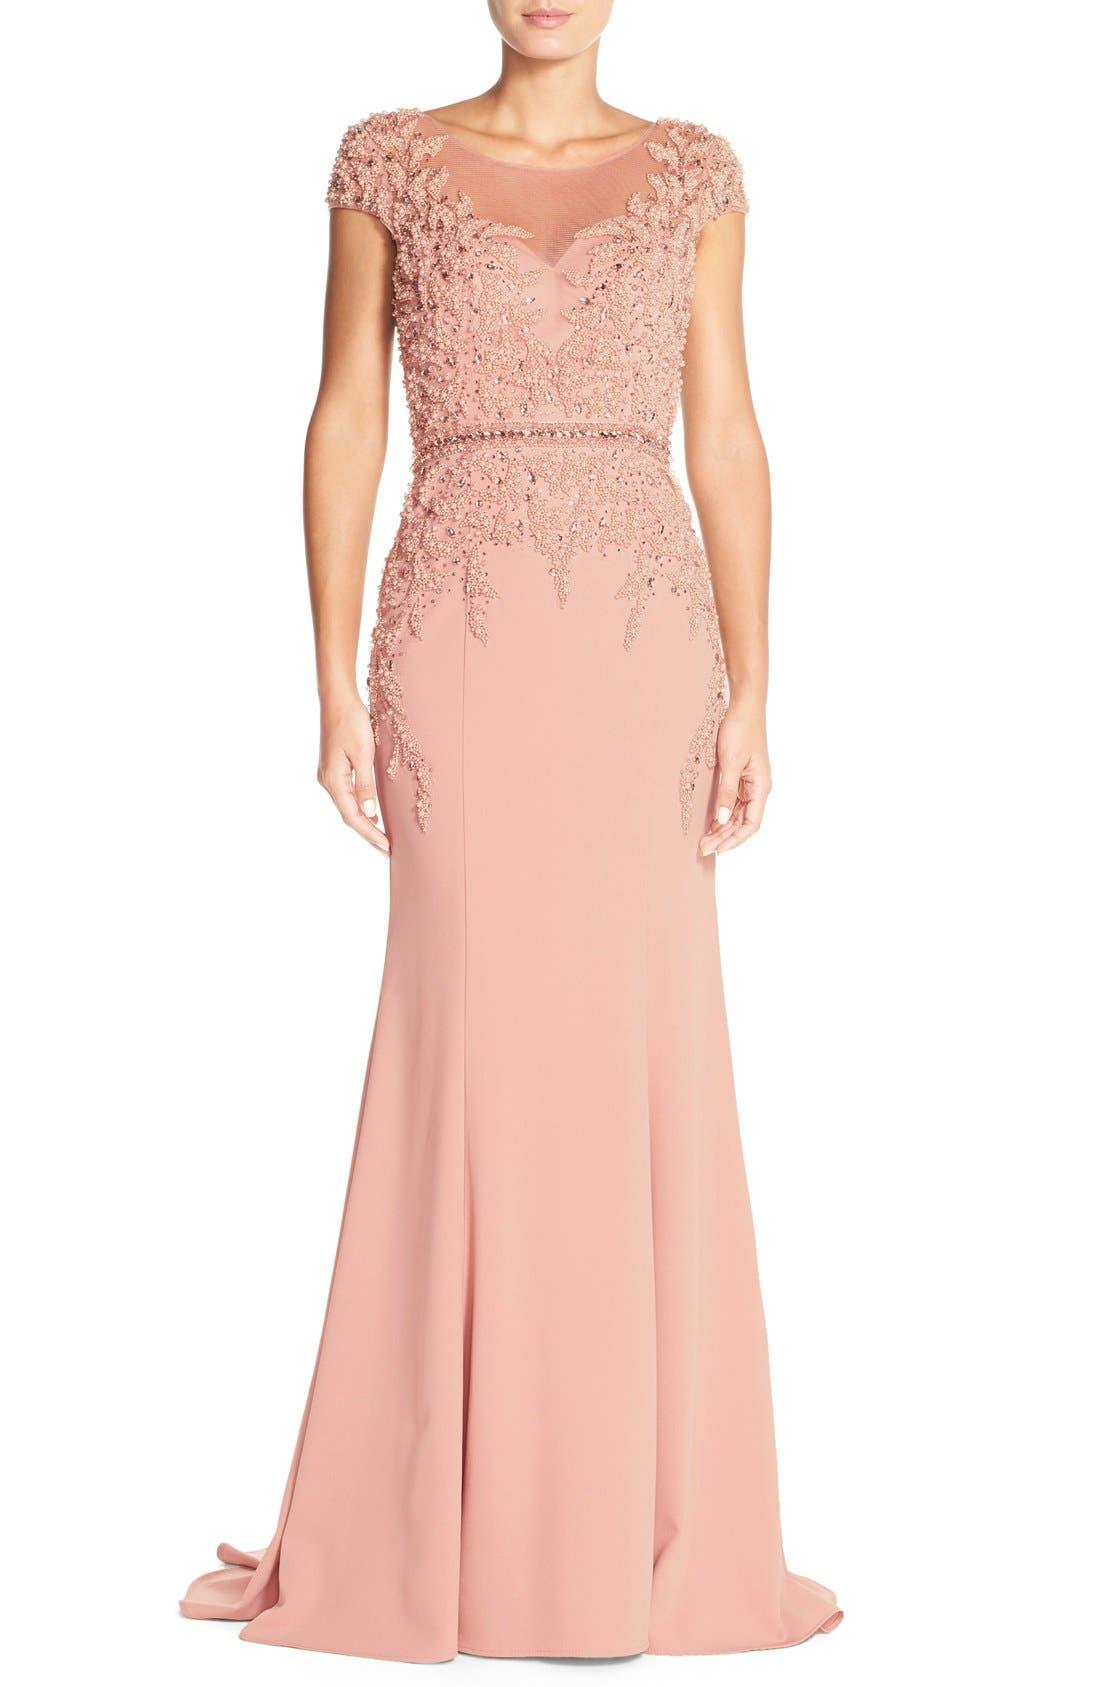 Crepe Mermaid Dress